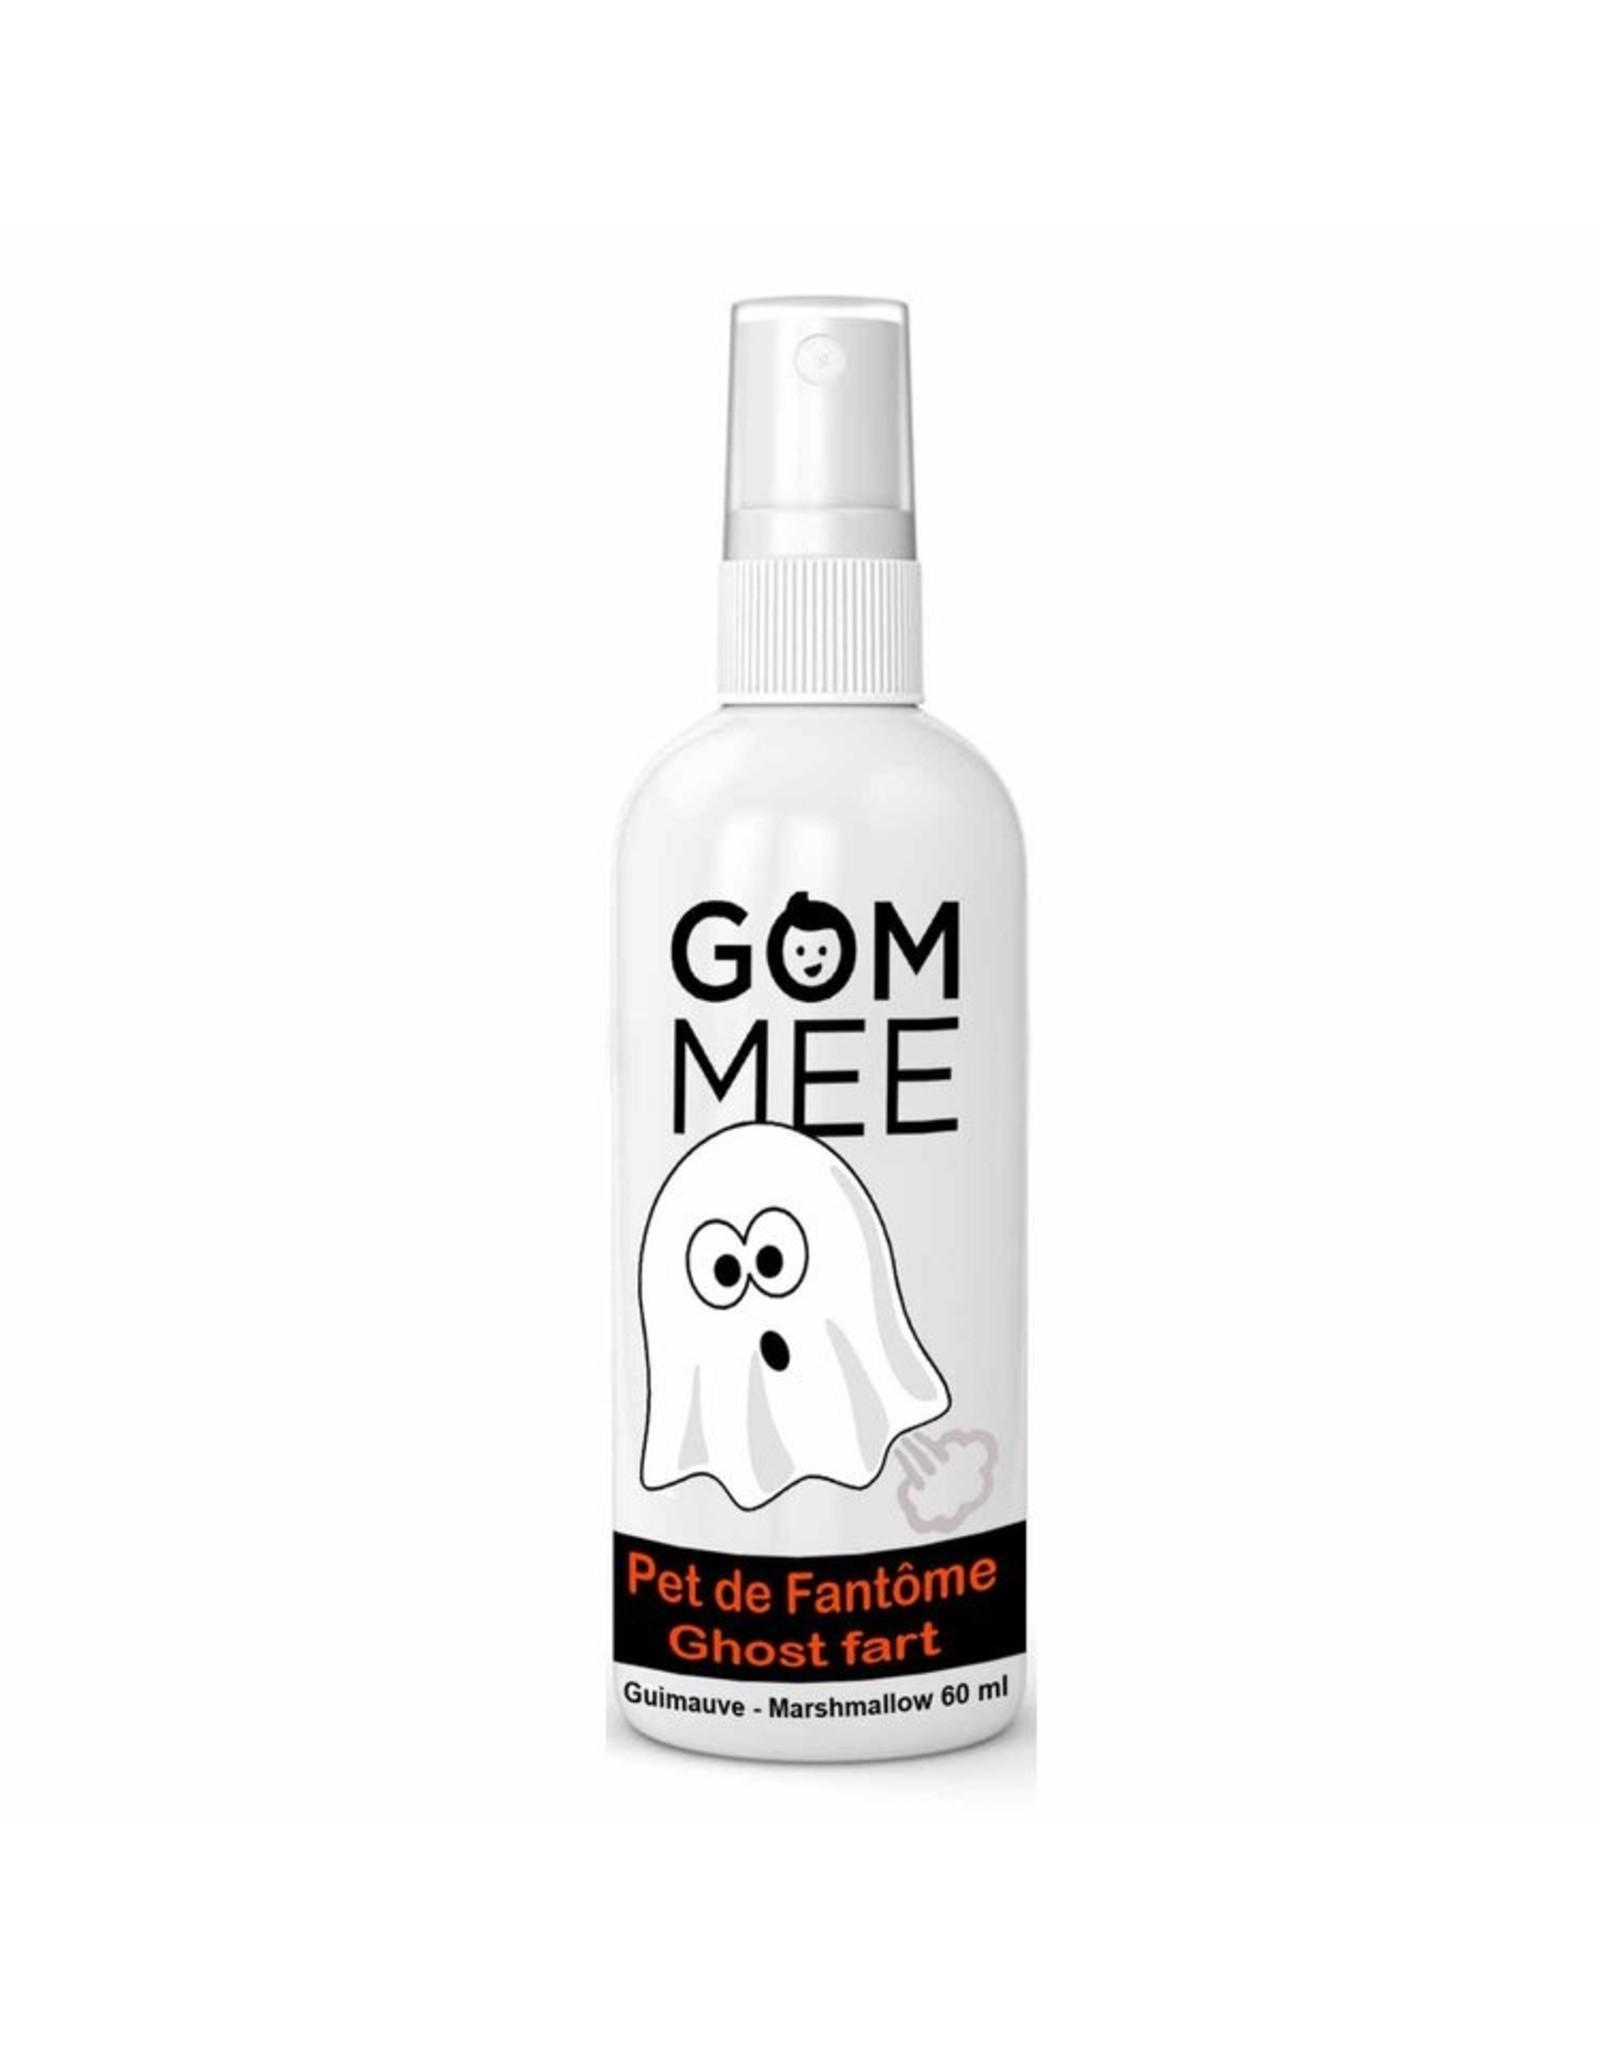 Gom-Mee Gom-Mee, Parfum d'Ambiance, Pet De Fantome